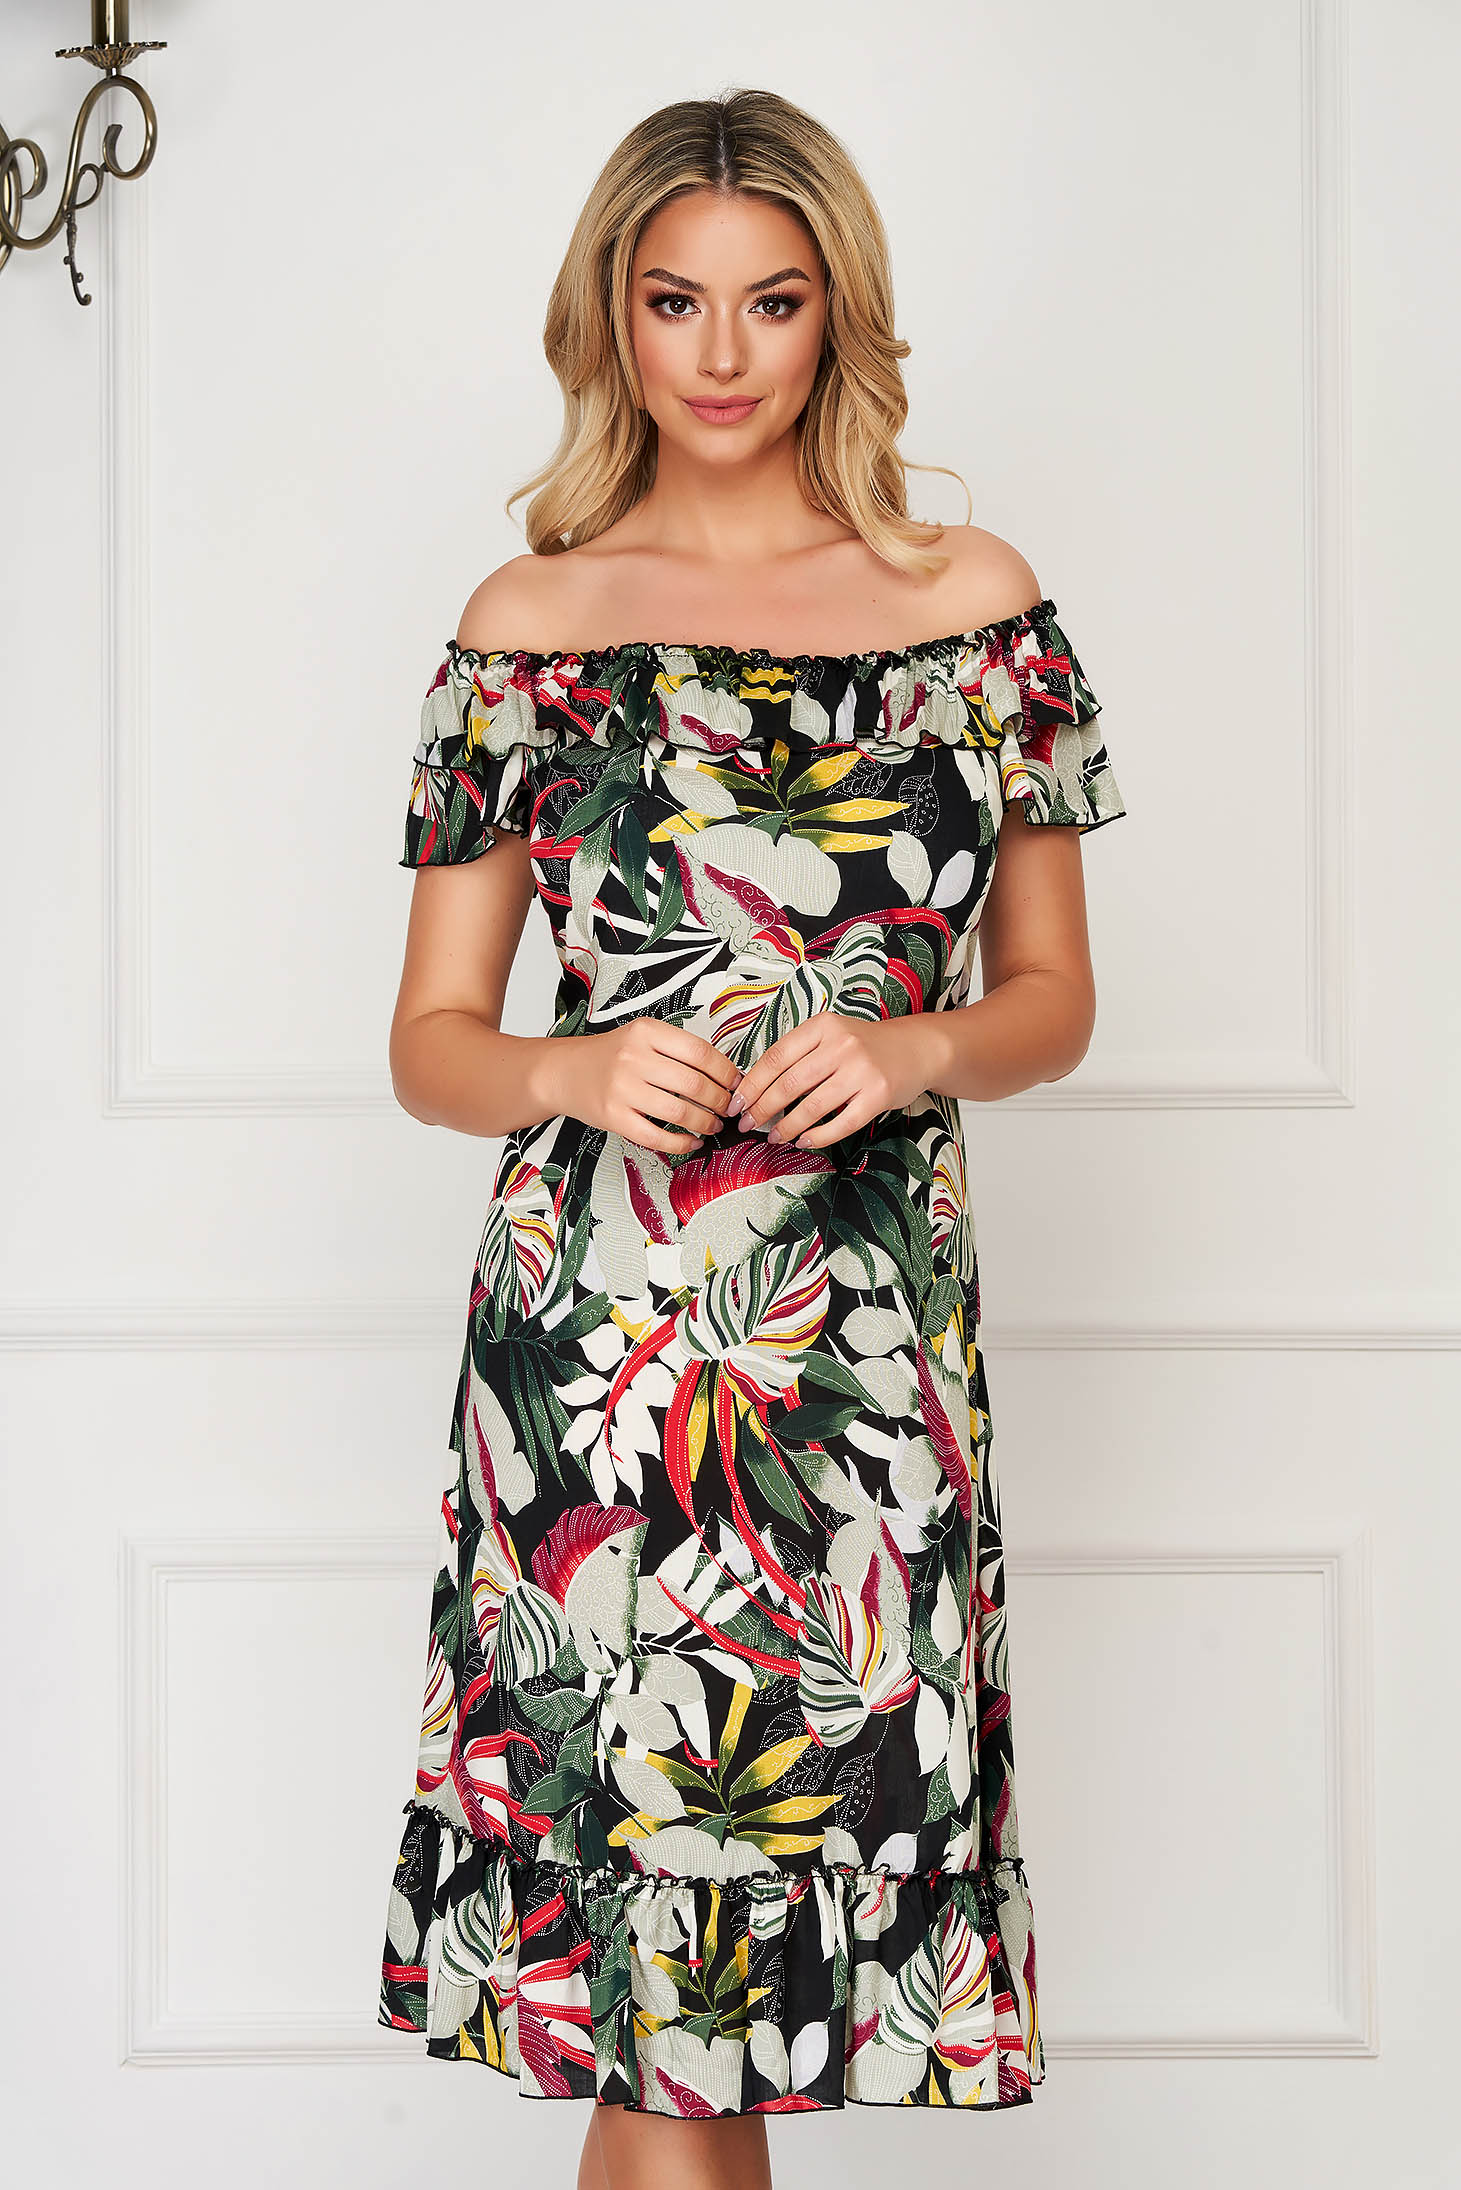 StarShinerS black dress midi daily flared off-shoulder thin fabric